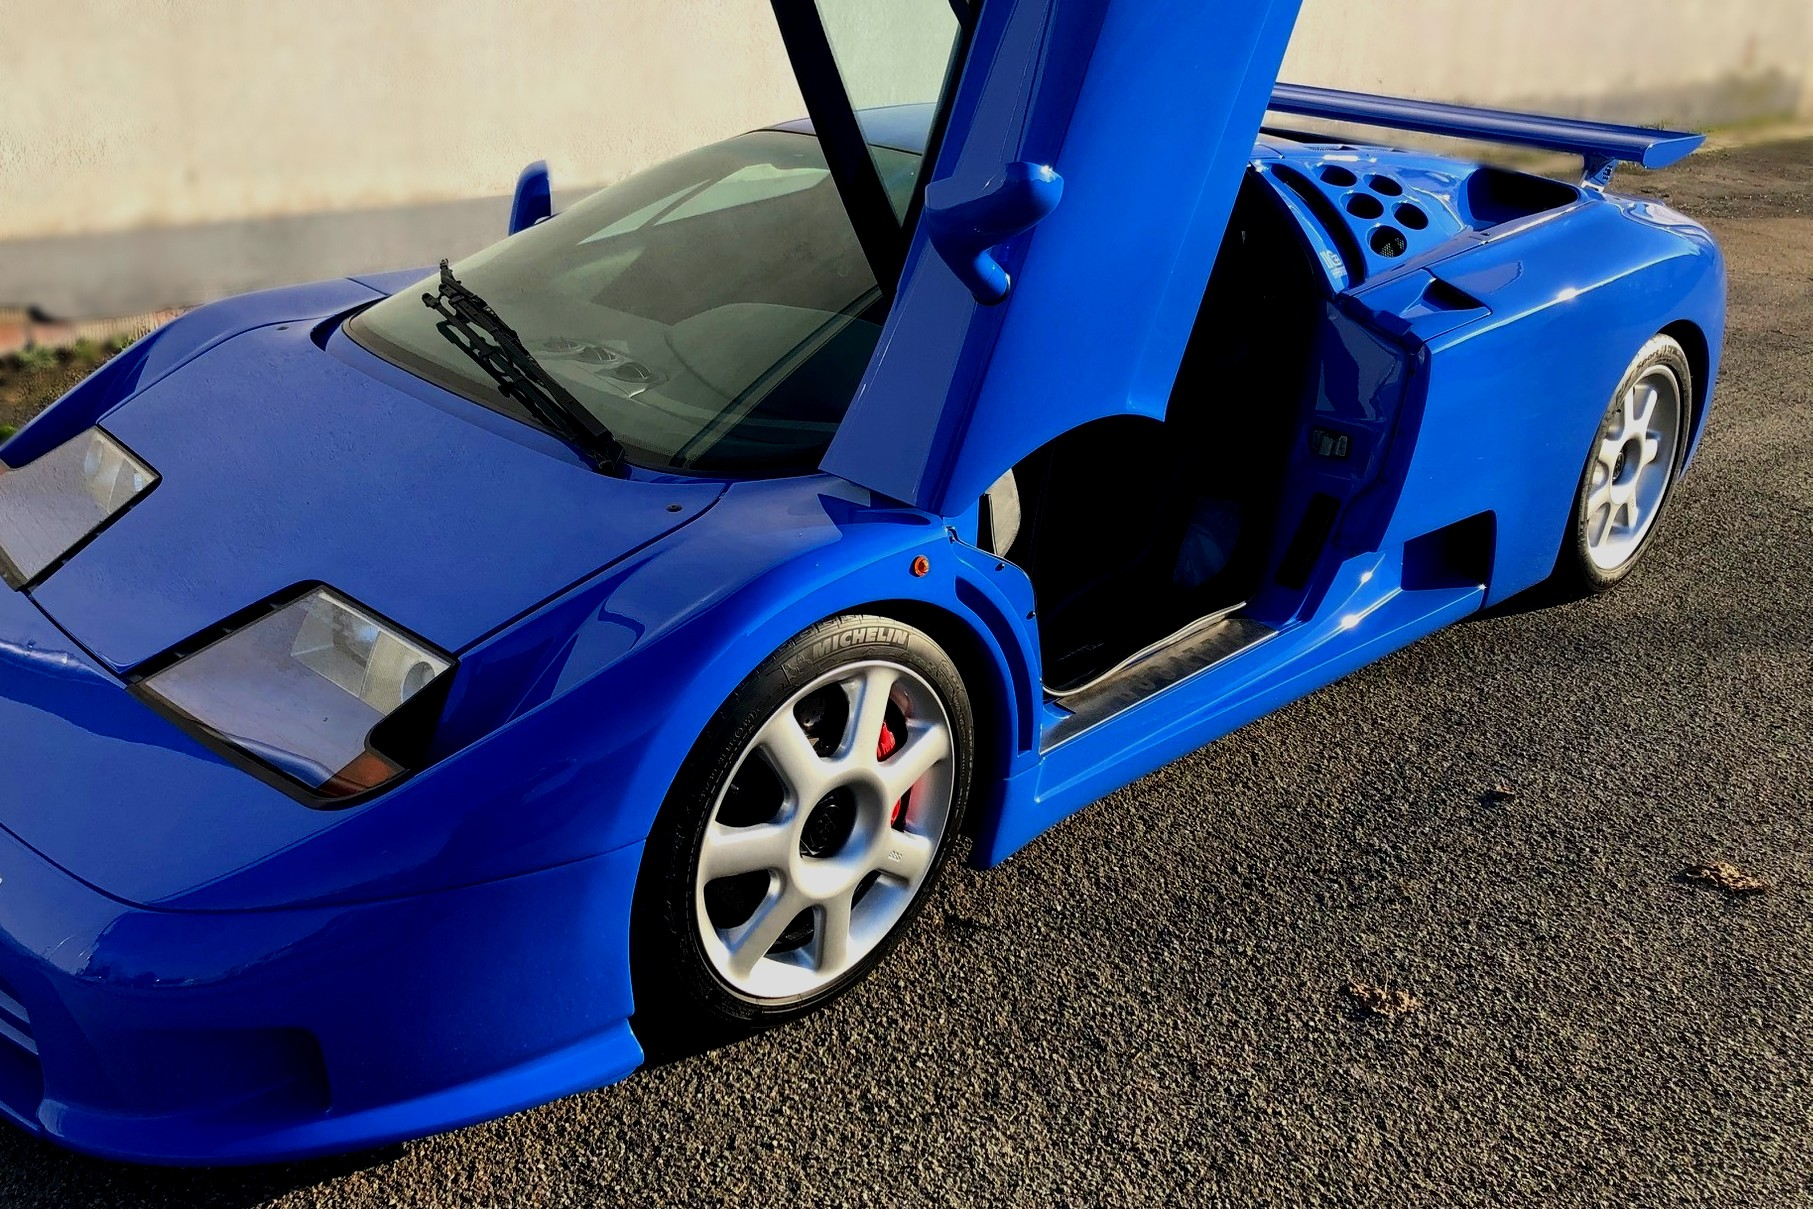 Best exotic cars of all times: 1995 Bugatti EB 110 4x4, Munich, Germany, approx. $3,279,506.